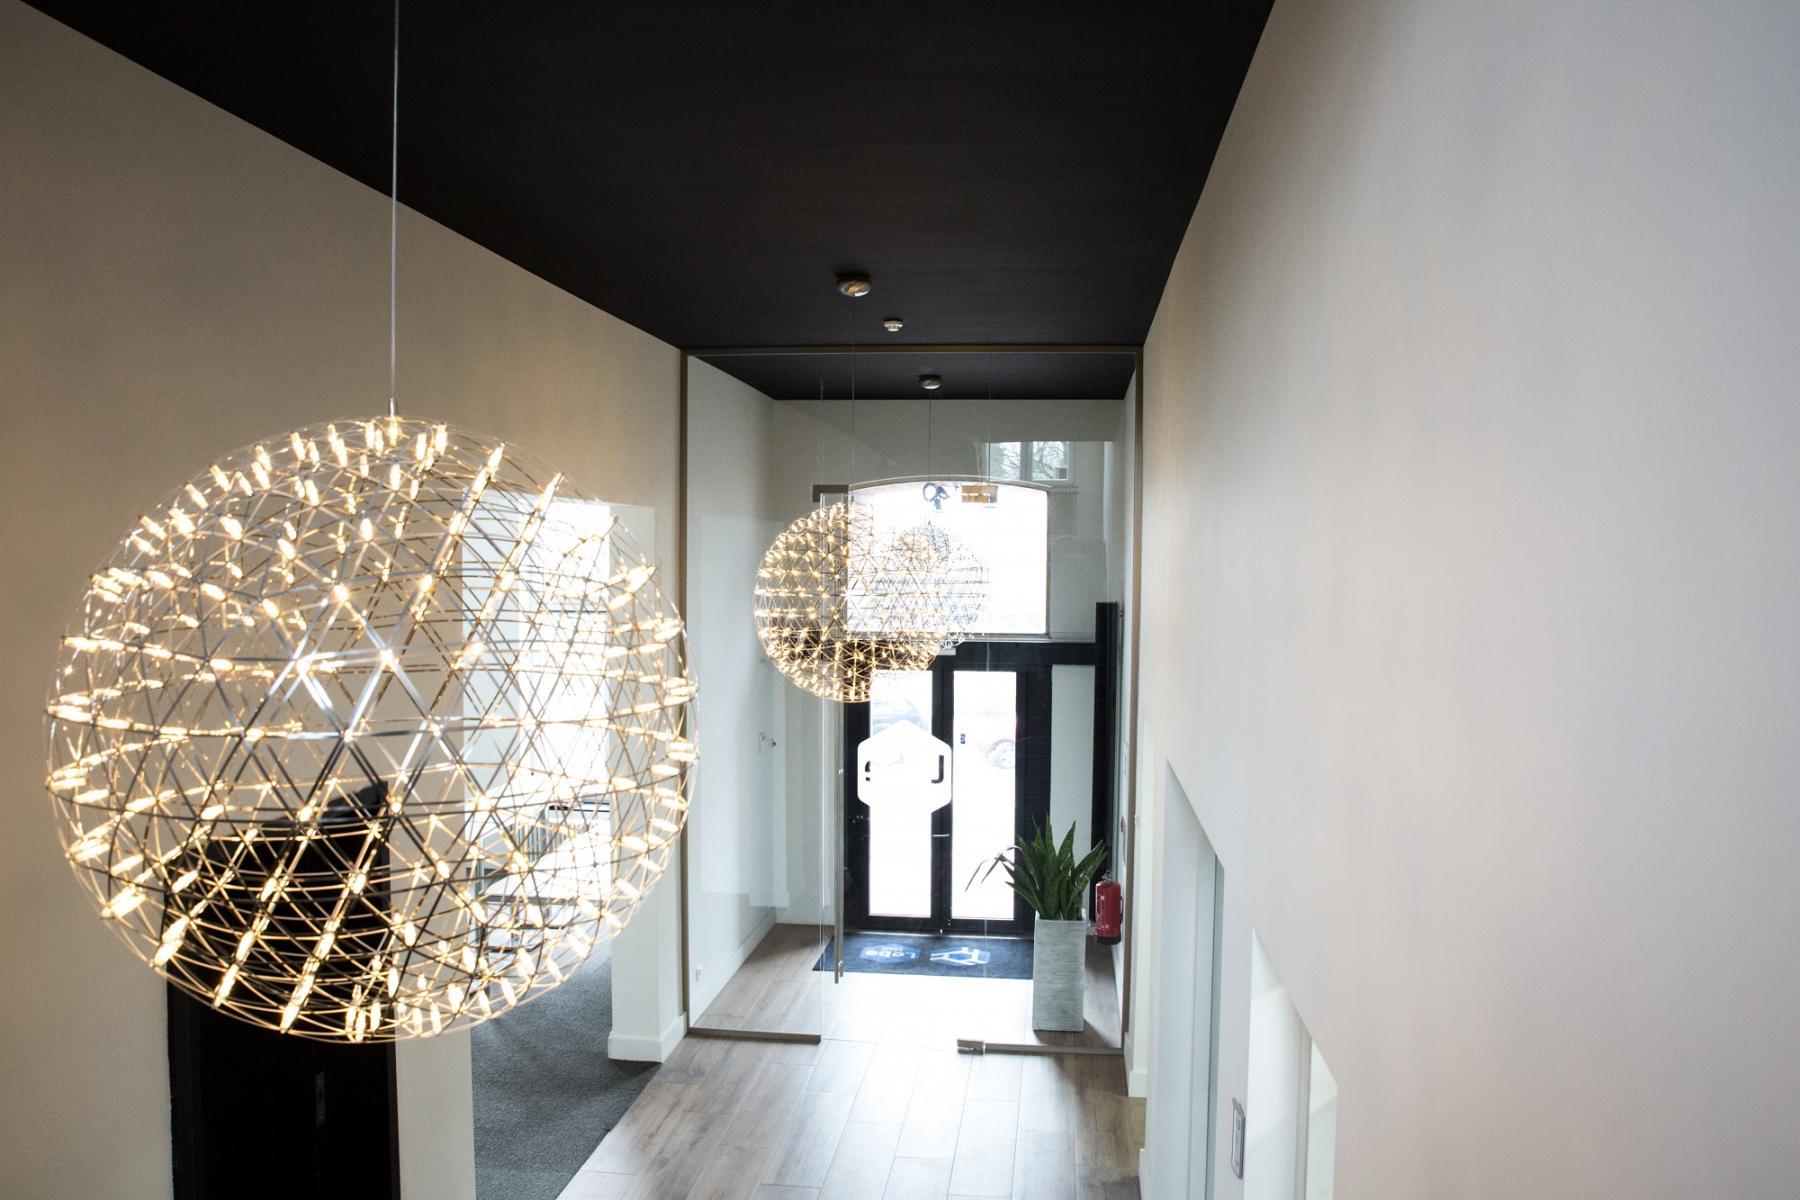 lights hallway nice entrance doors white wall